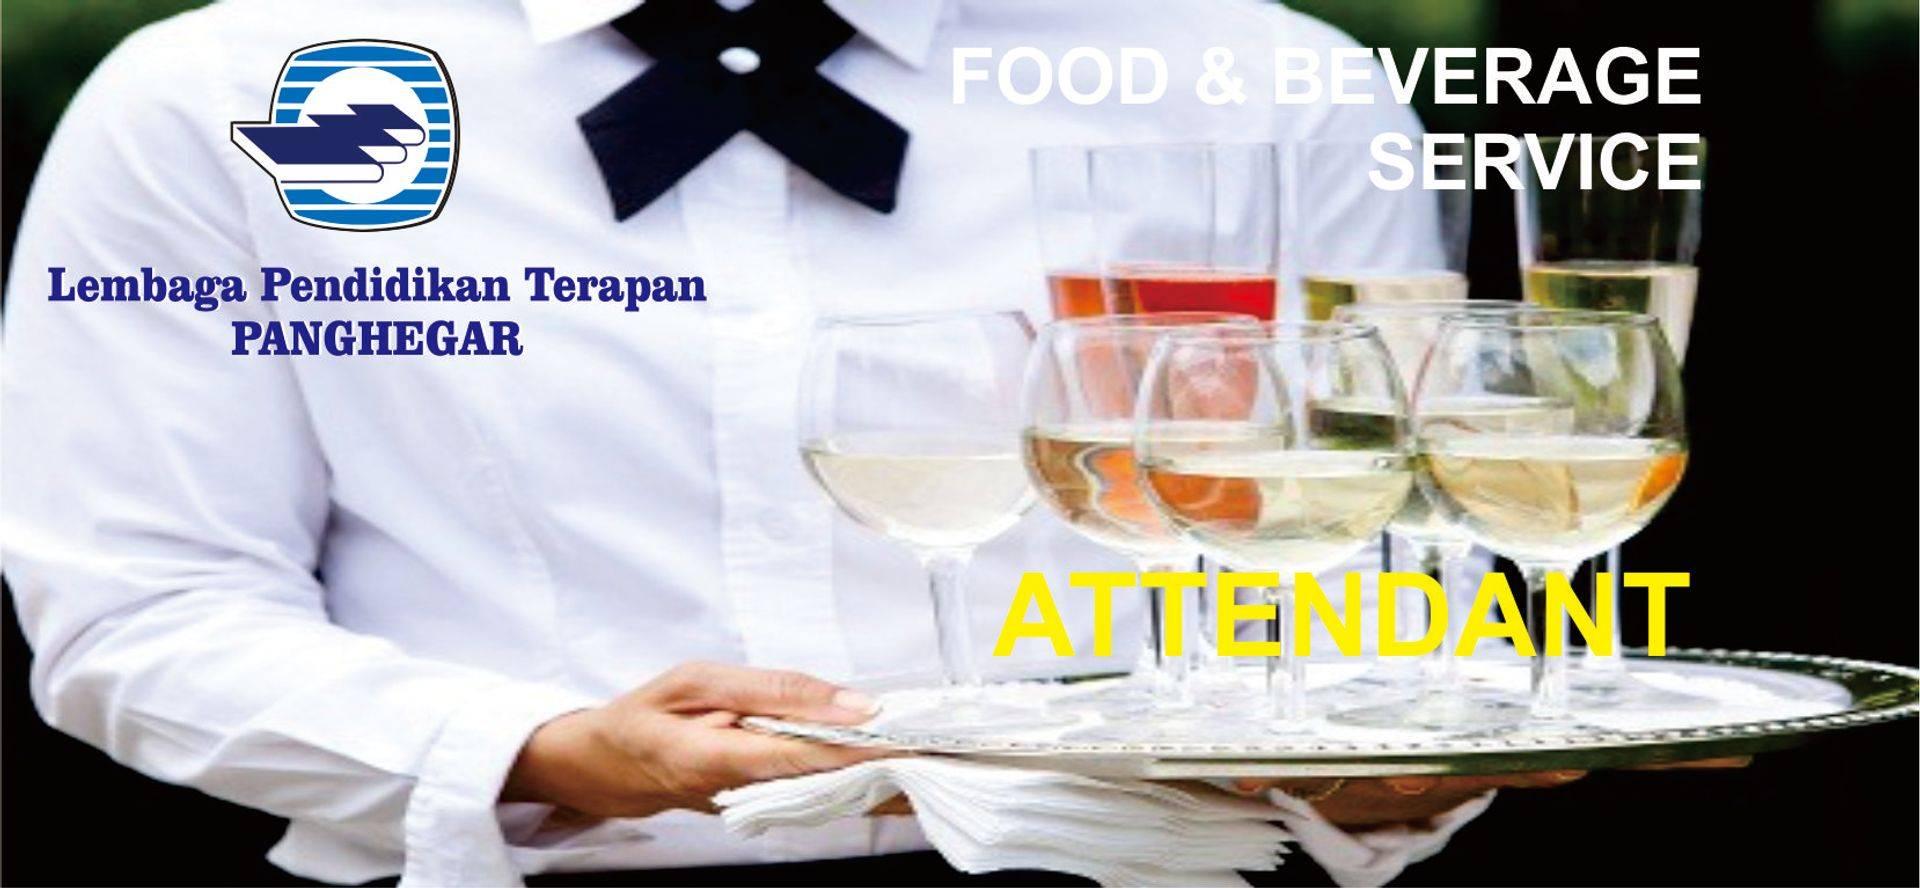 Restaurant Bar Attendant